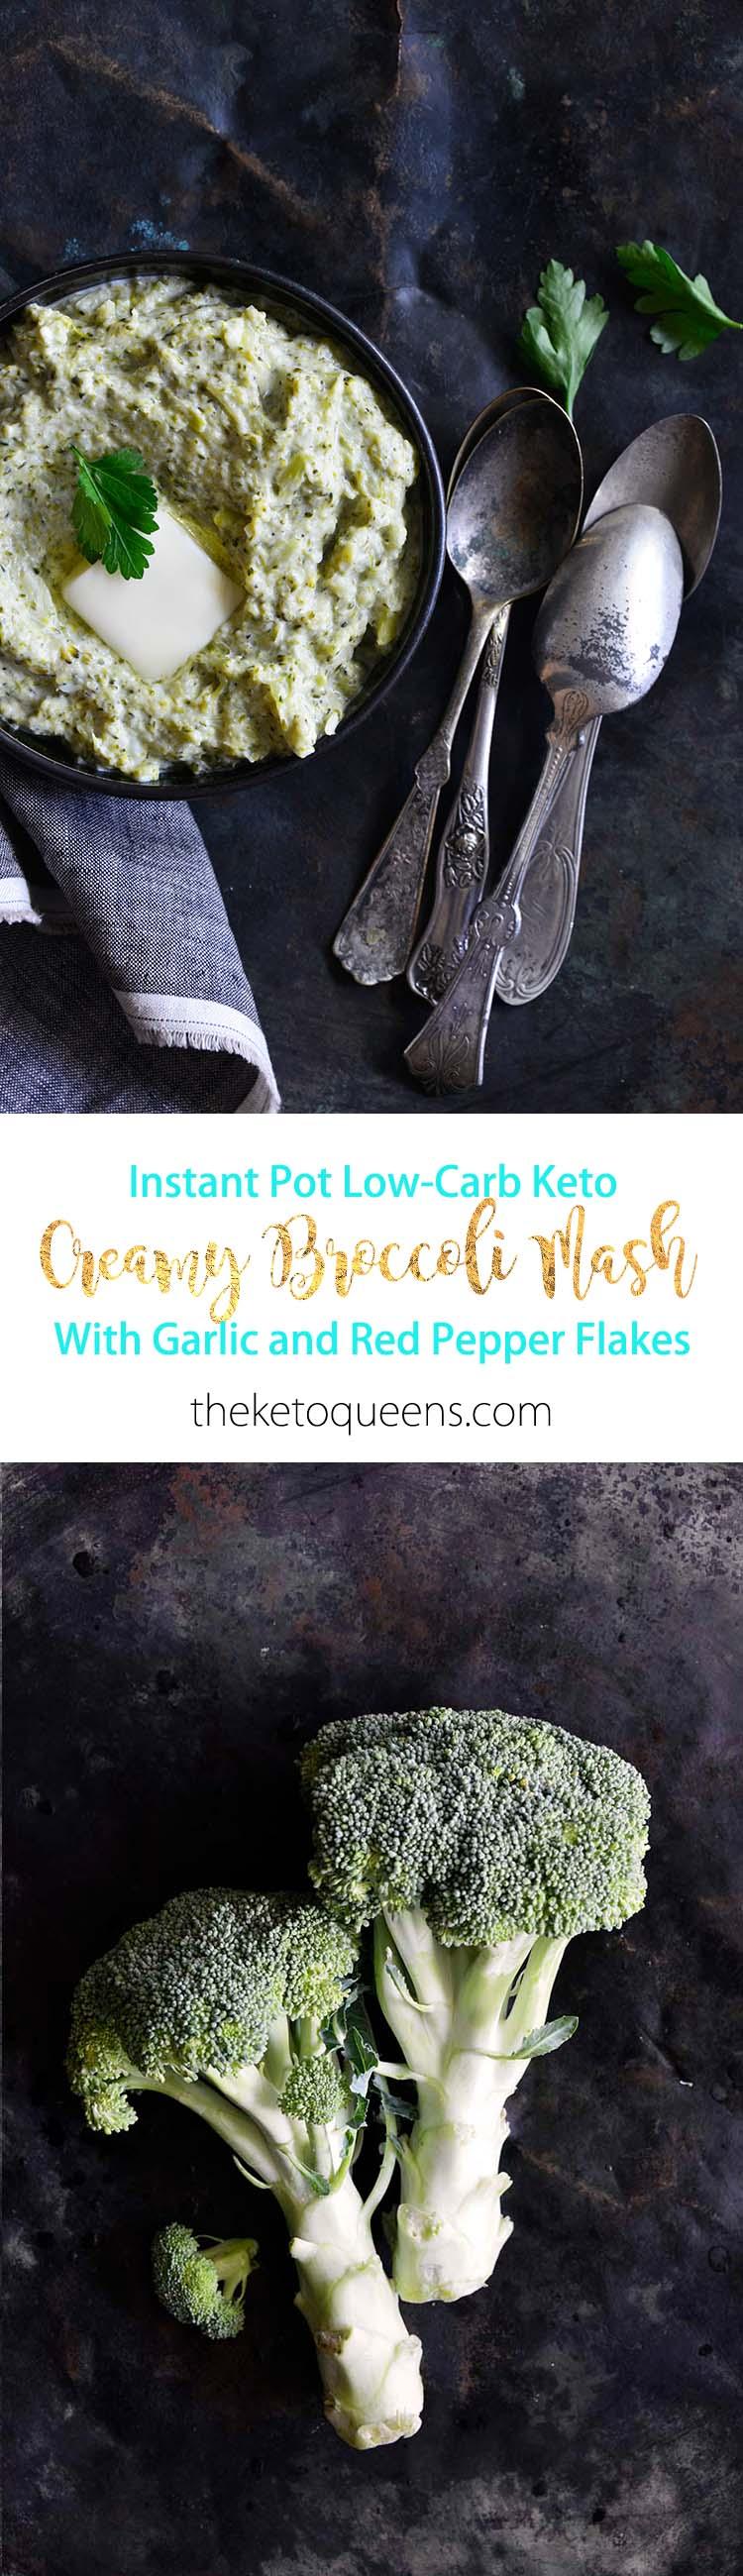 Instant Pot Keto Creamy Garlic Broccoli Mash Long Pin